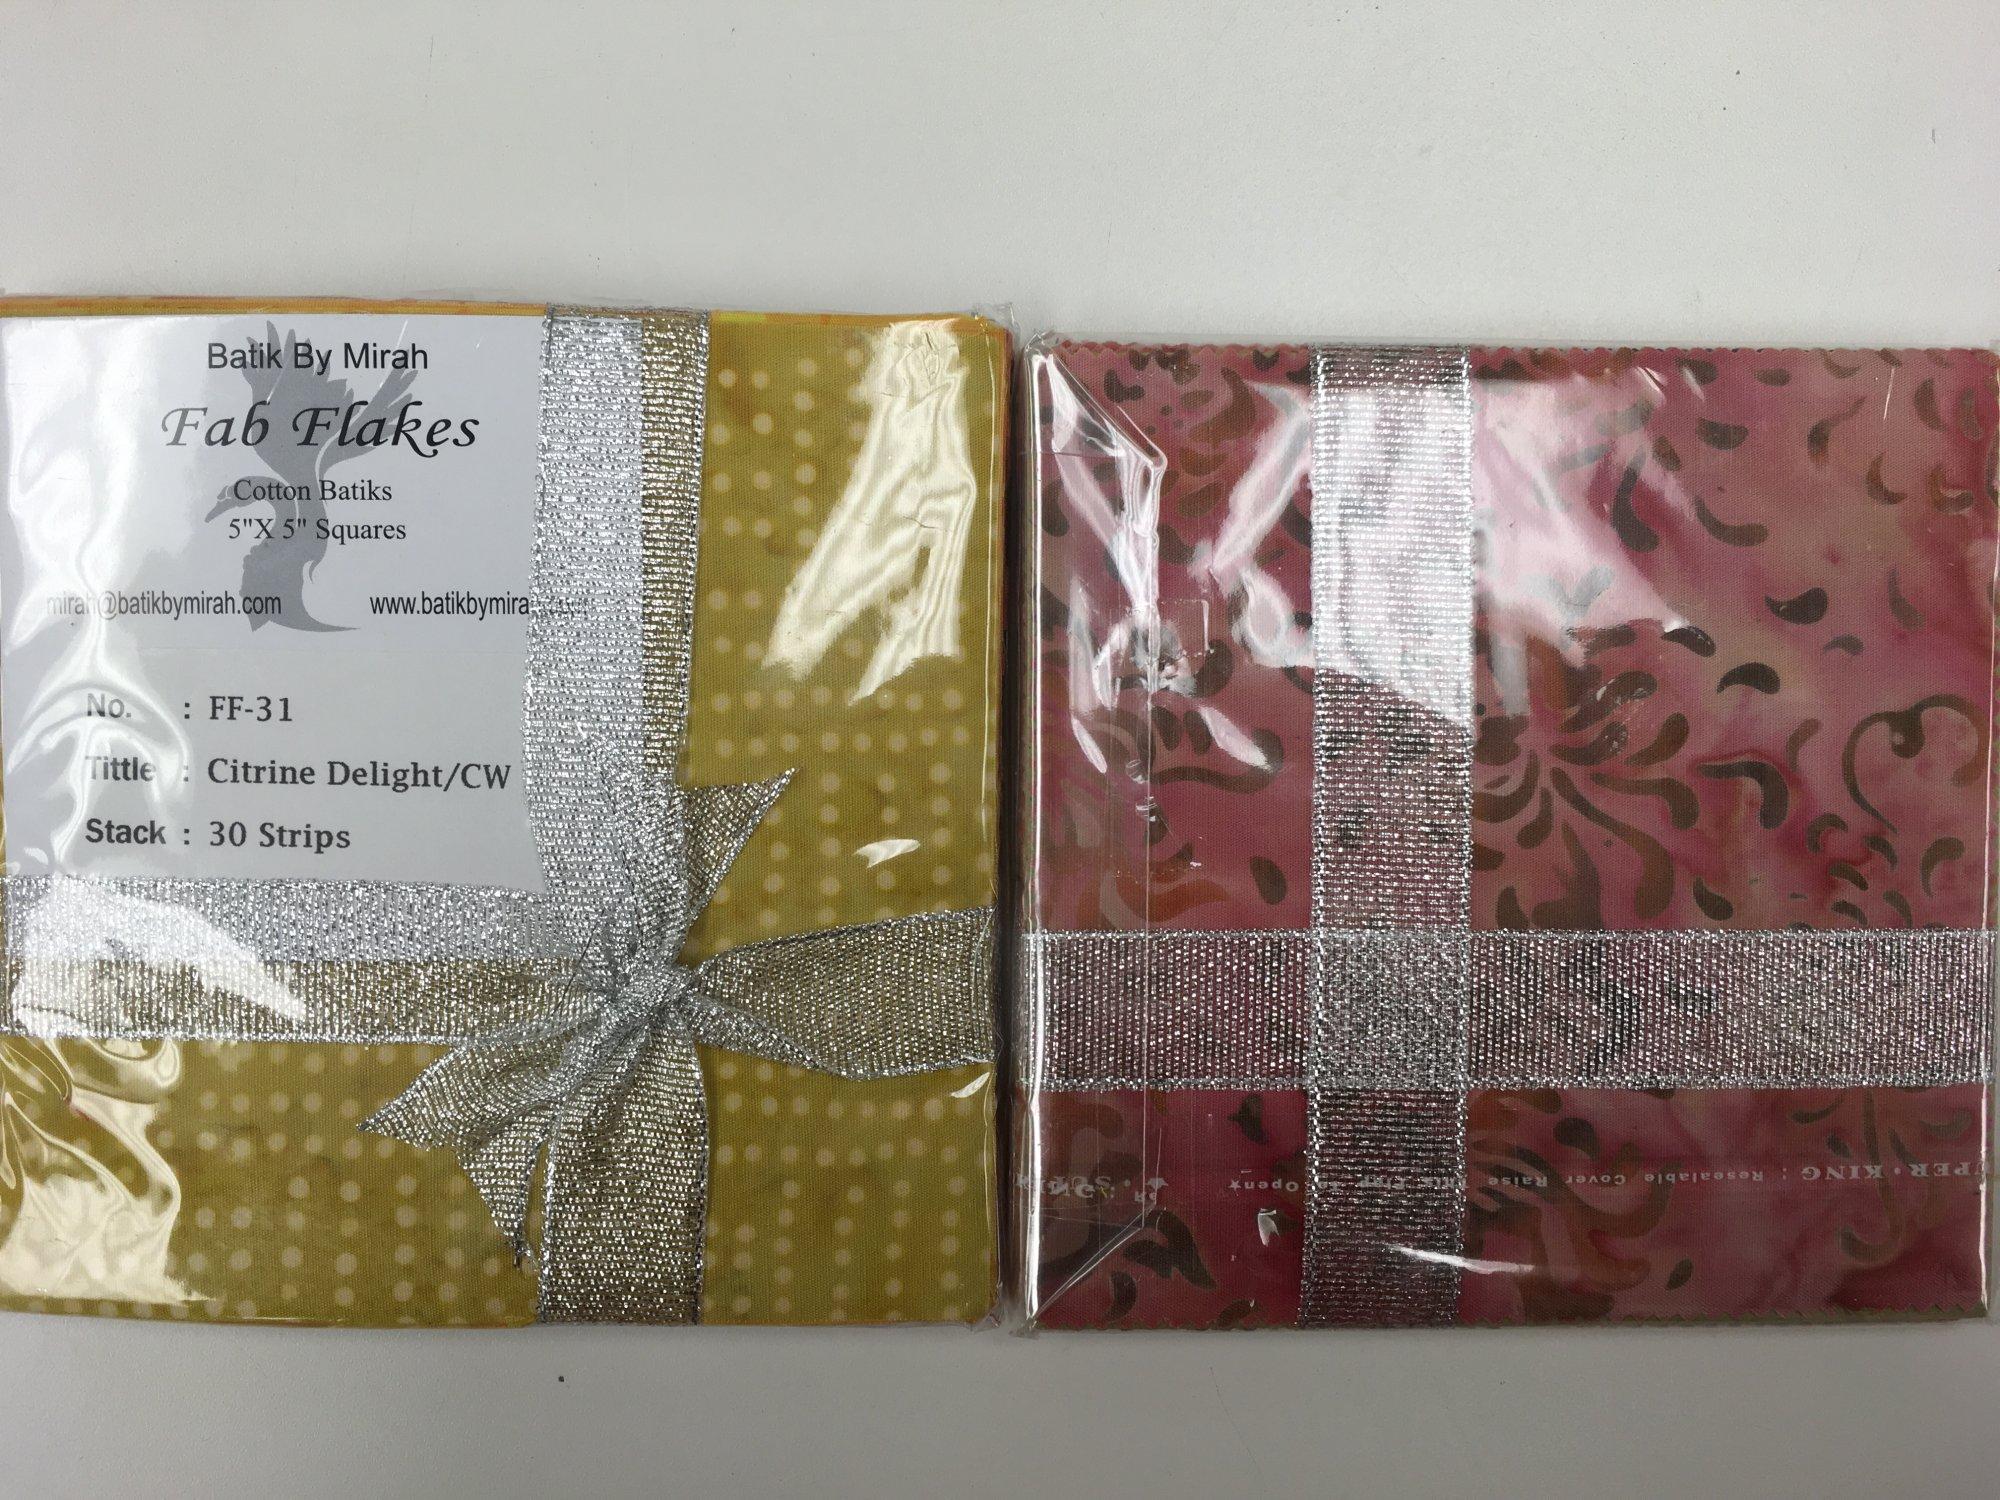 BATIK CITRINE DELIGHT FAB FLAKES 24/pack 5 inch Squares FF31 Batik by Mirah